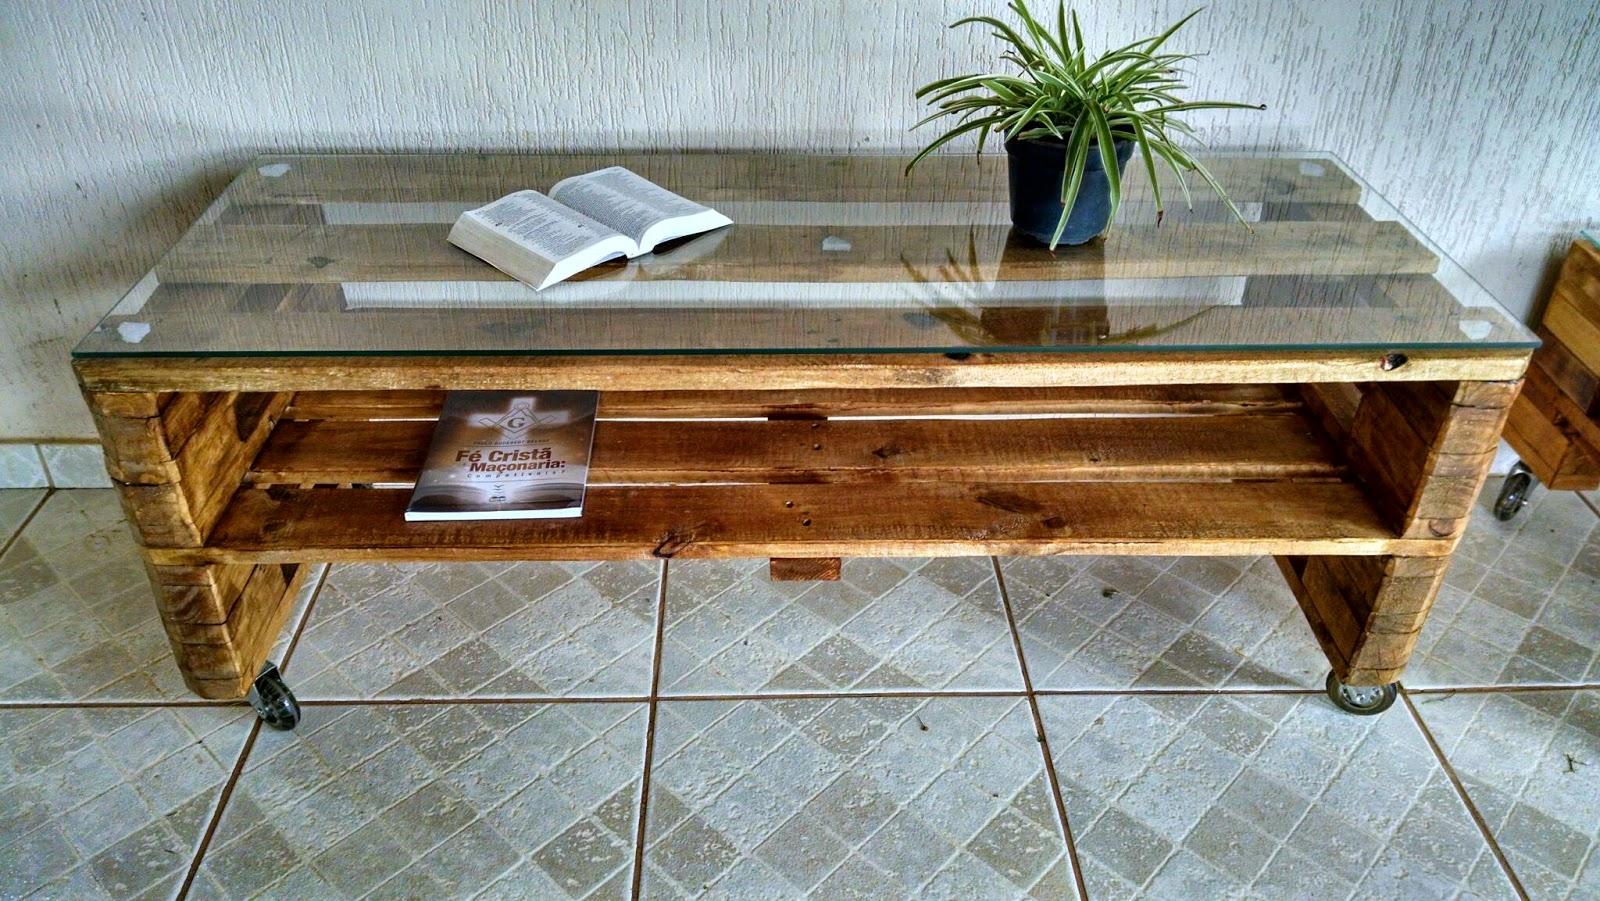 Excepcional Casa Paletes - Móveis Rústicos: Rack de paletes CN46